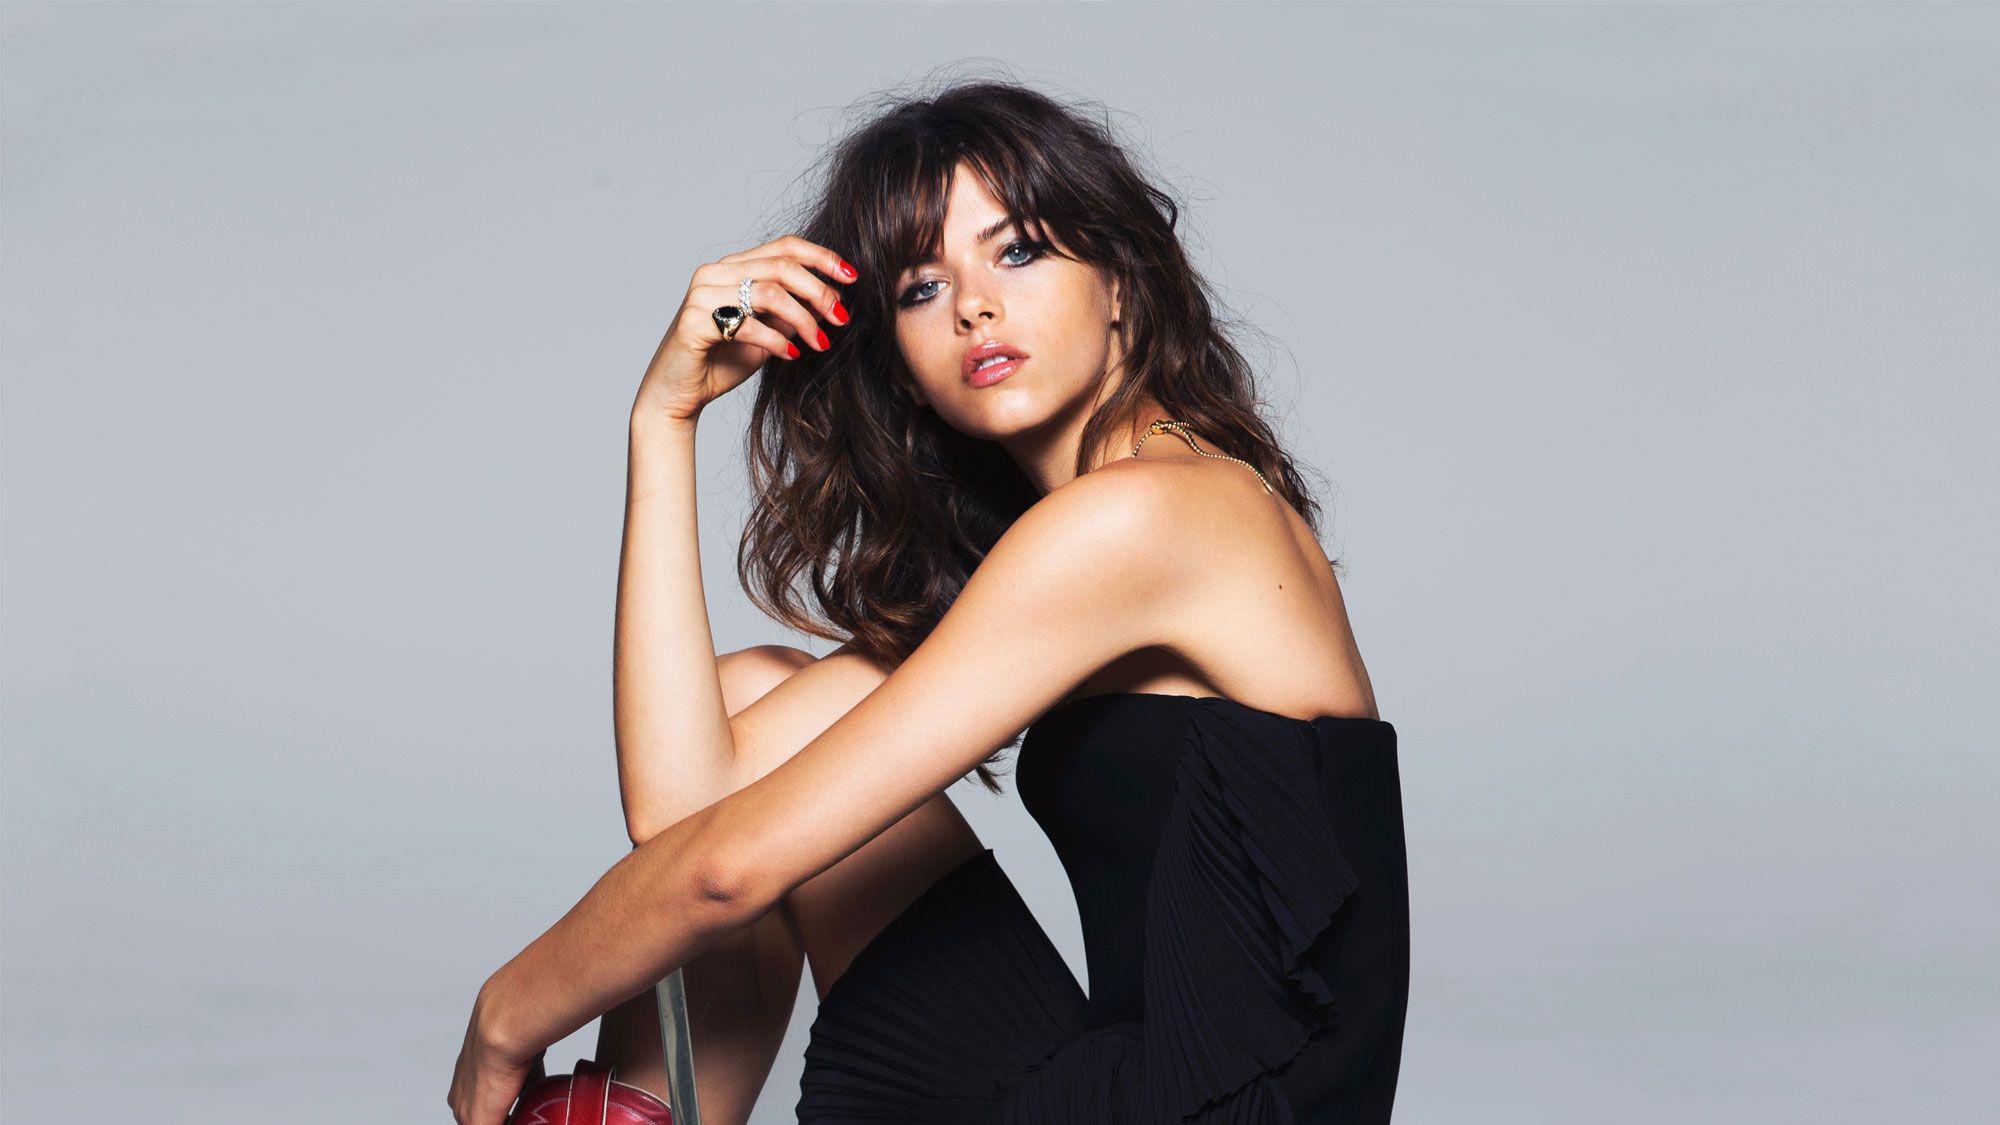 georgia fowler woman model hd wallpaper 2238